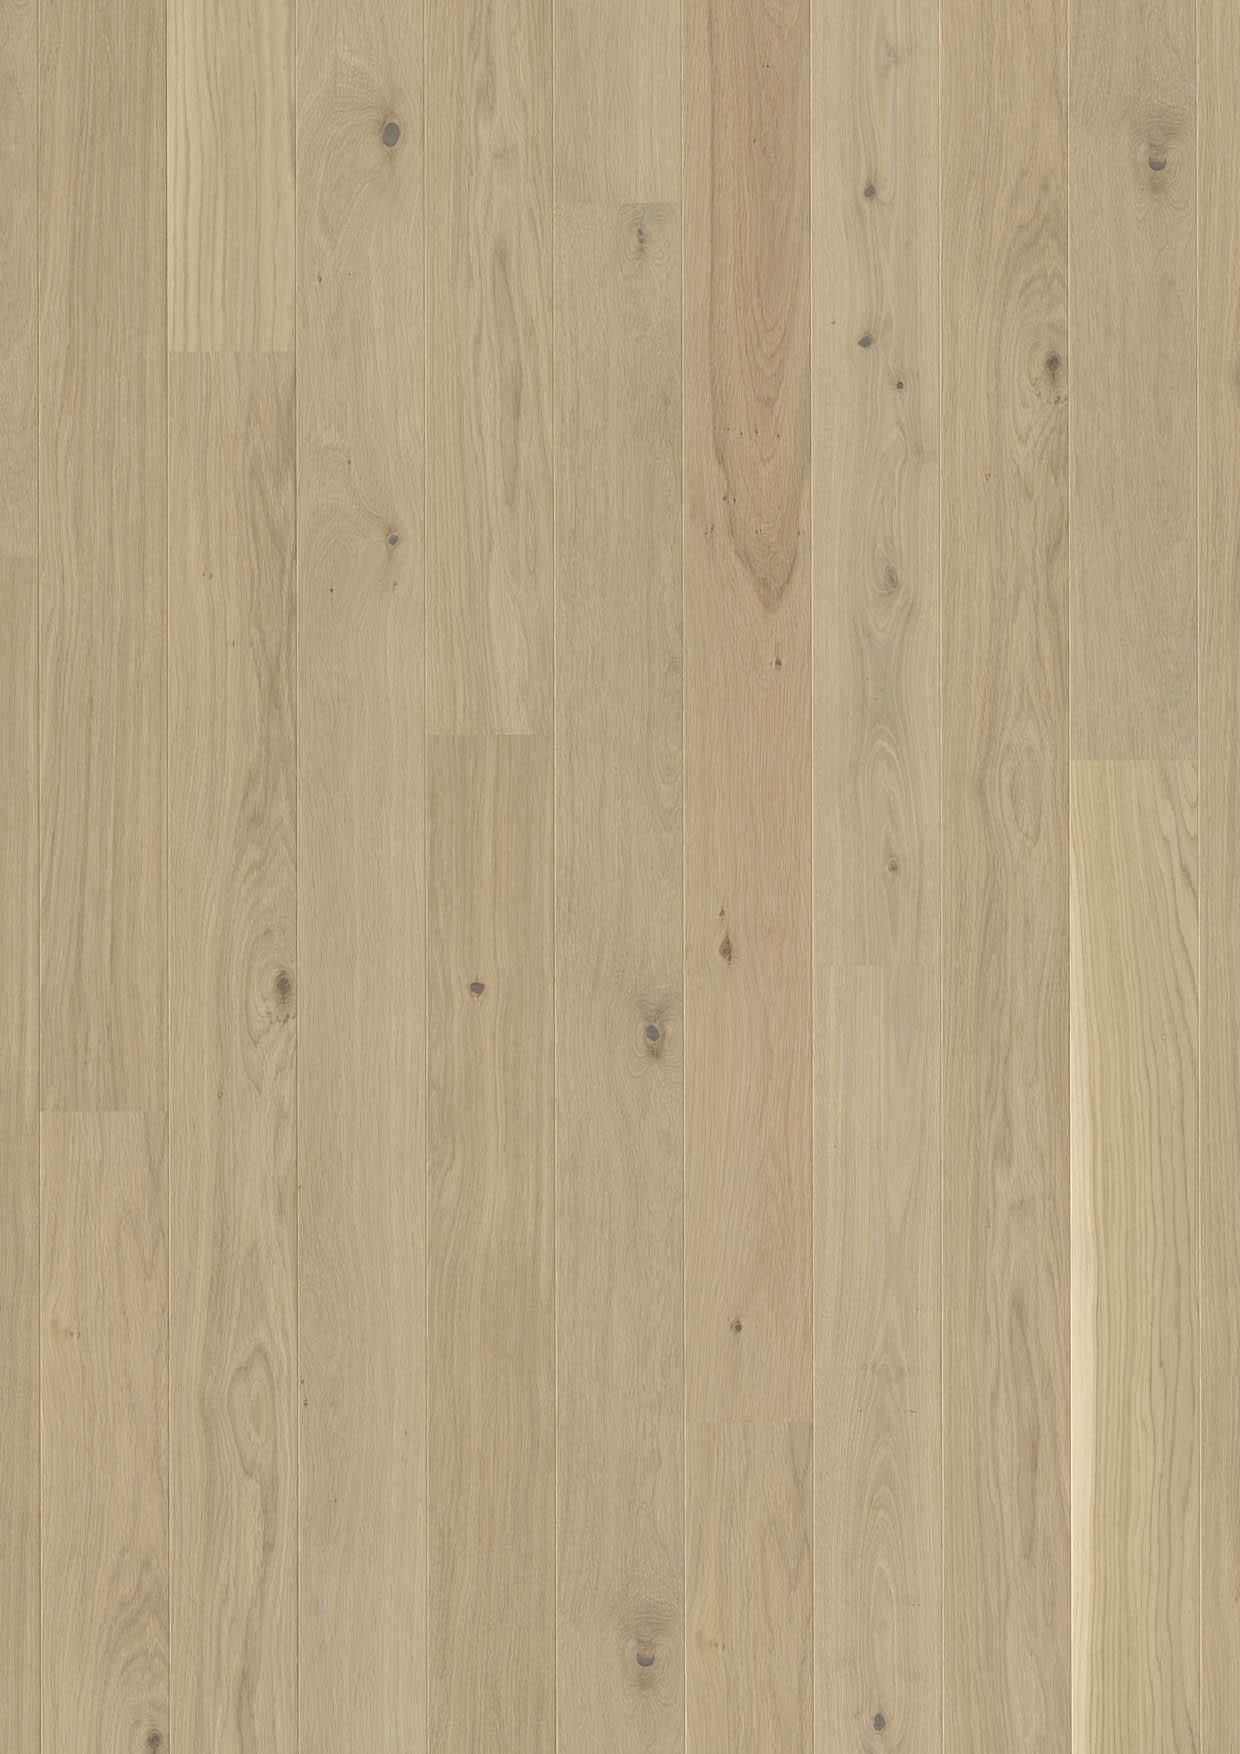 boen hardwood flooring usa of da…b live pure animoso planked live pure lakier pa³a'matowy 14 x 138 within ebg843fd